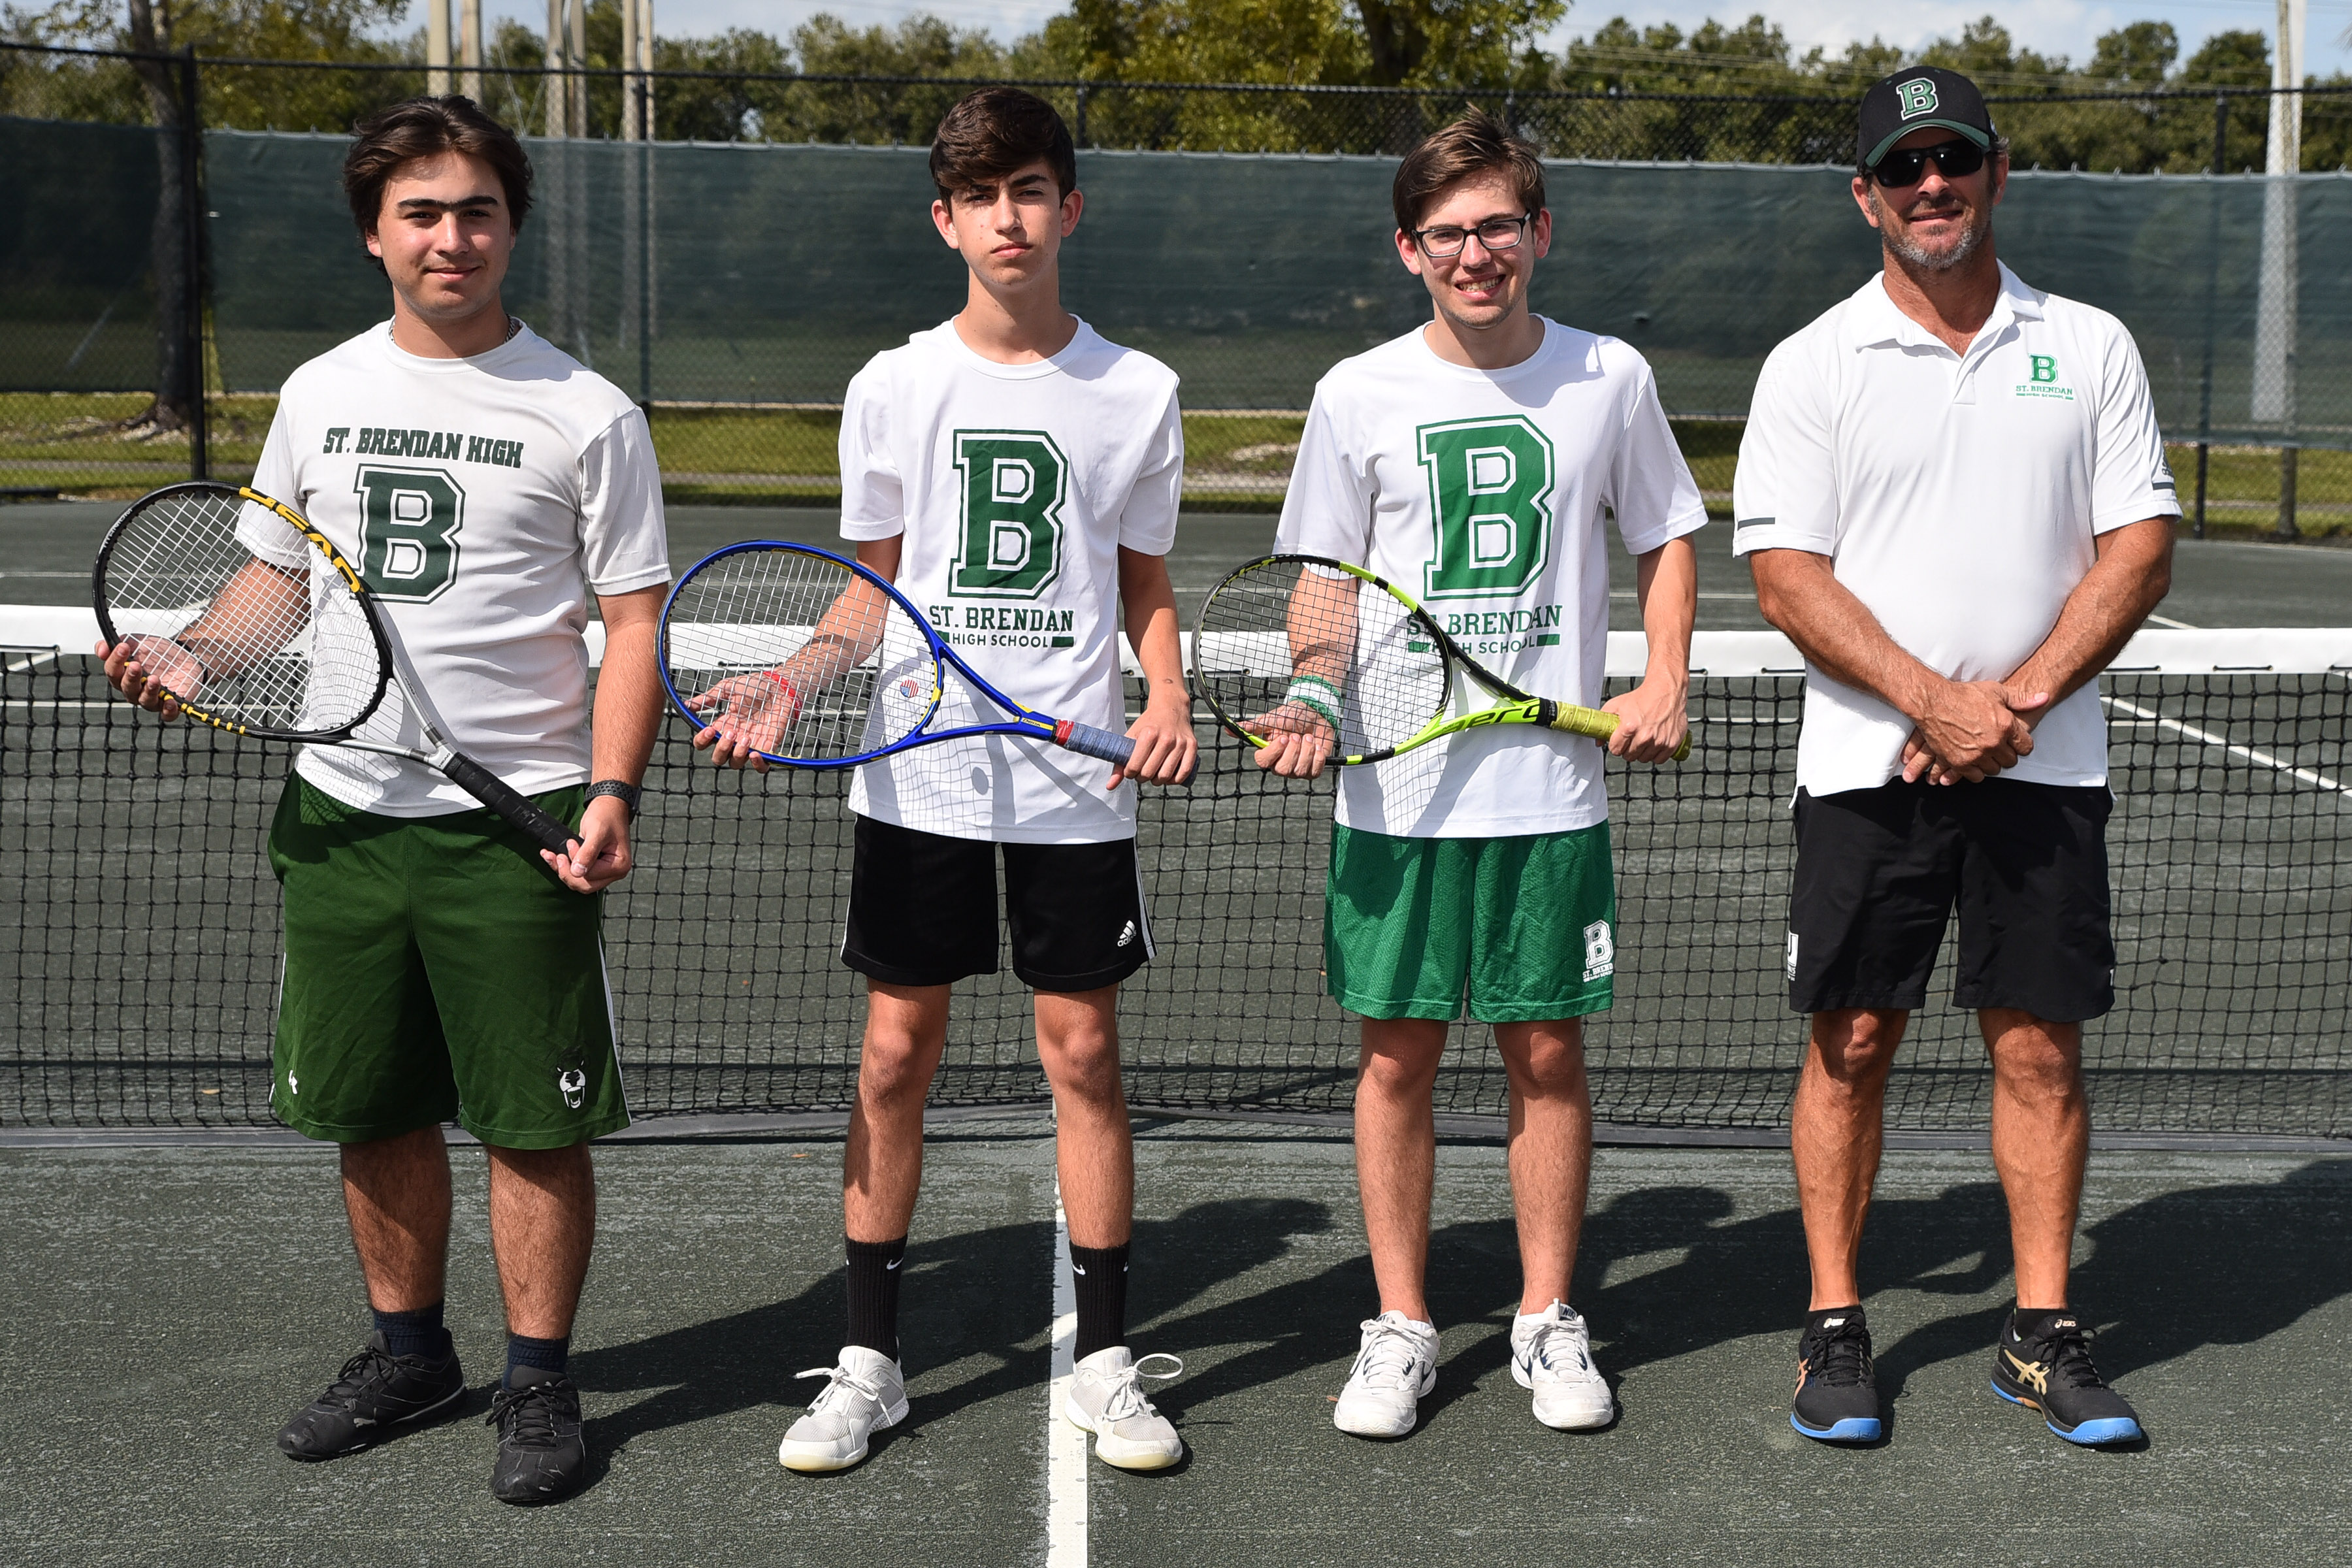 B Tennis